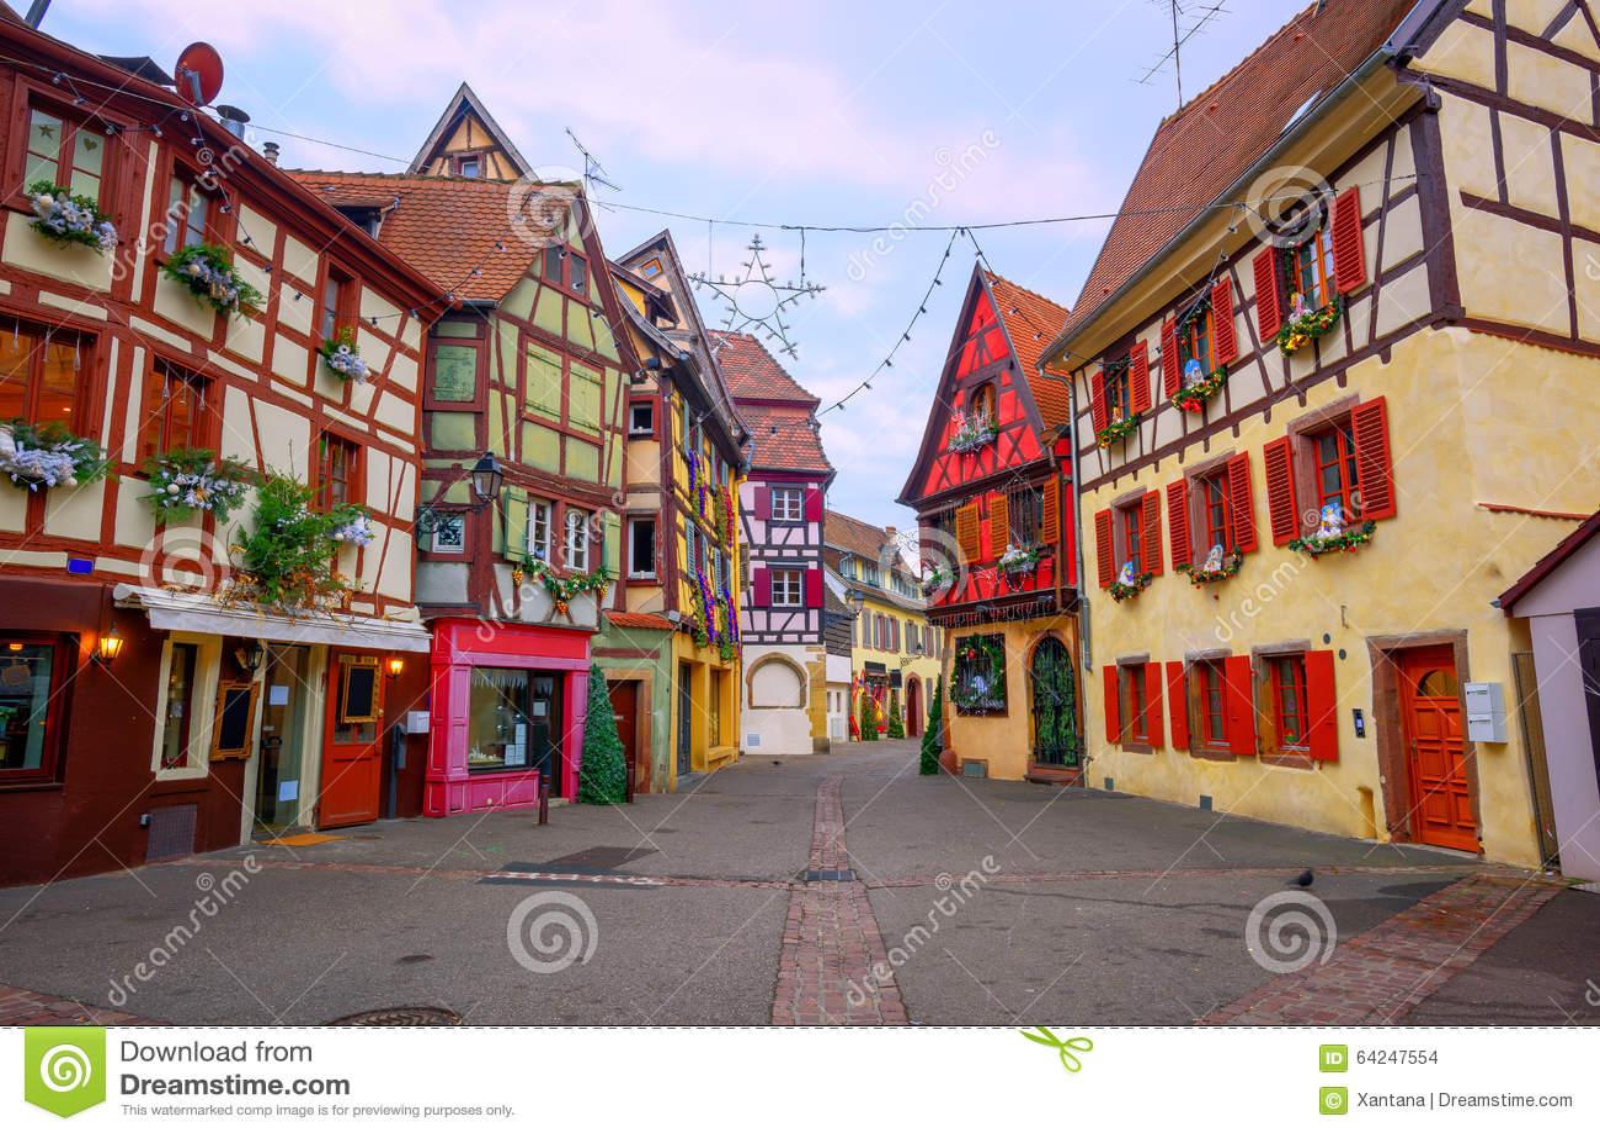 Maisons A Colombage Traditionnelles A Colmar Alsace France Photo